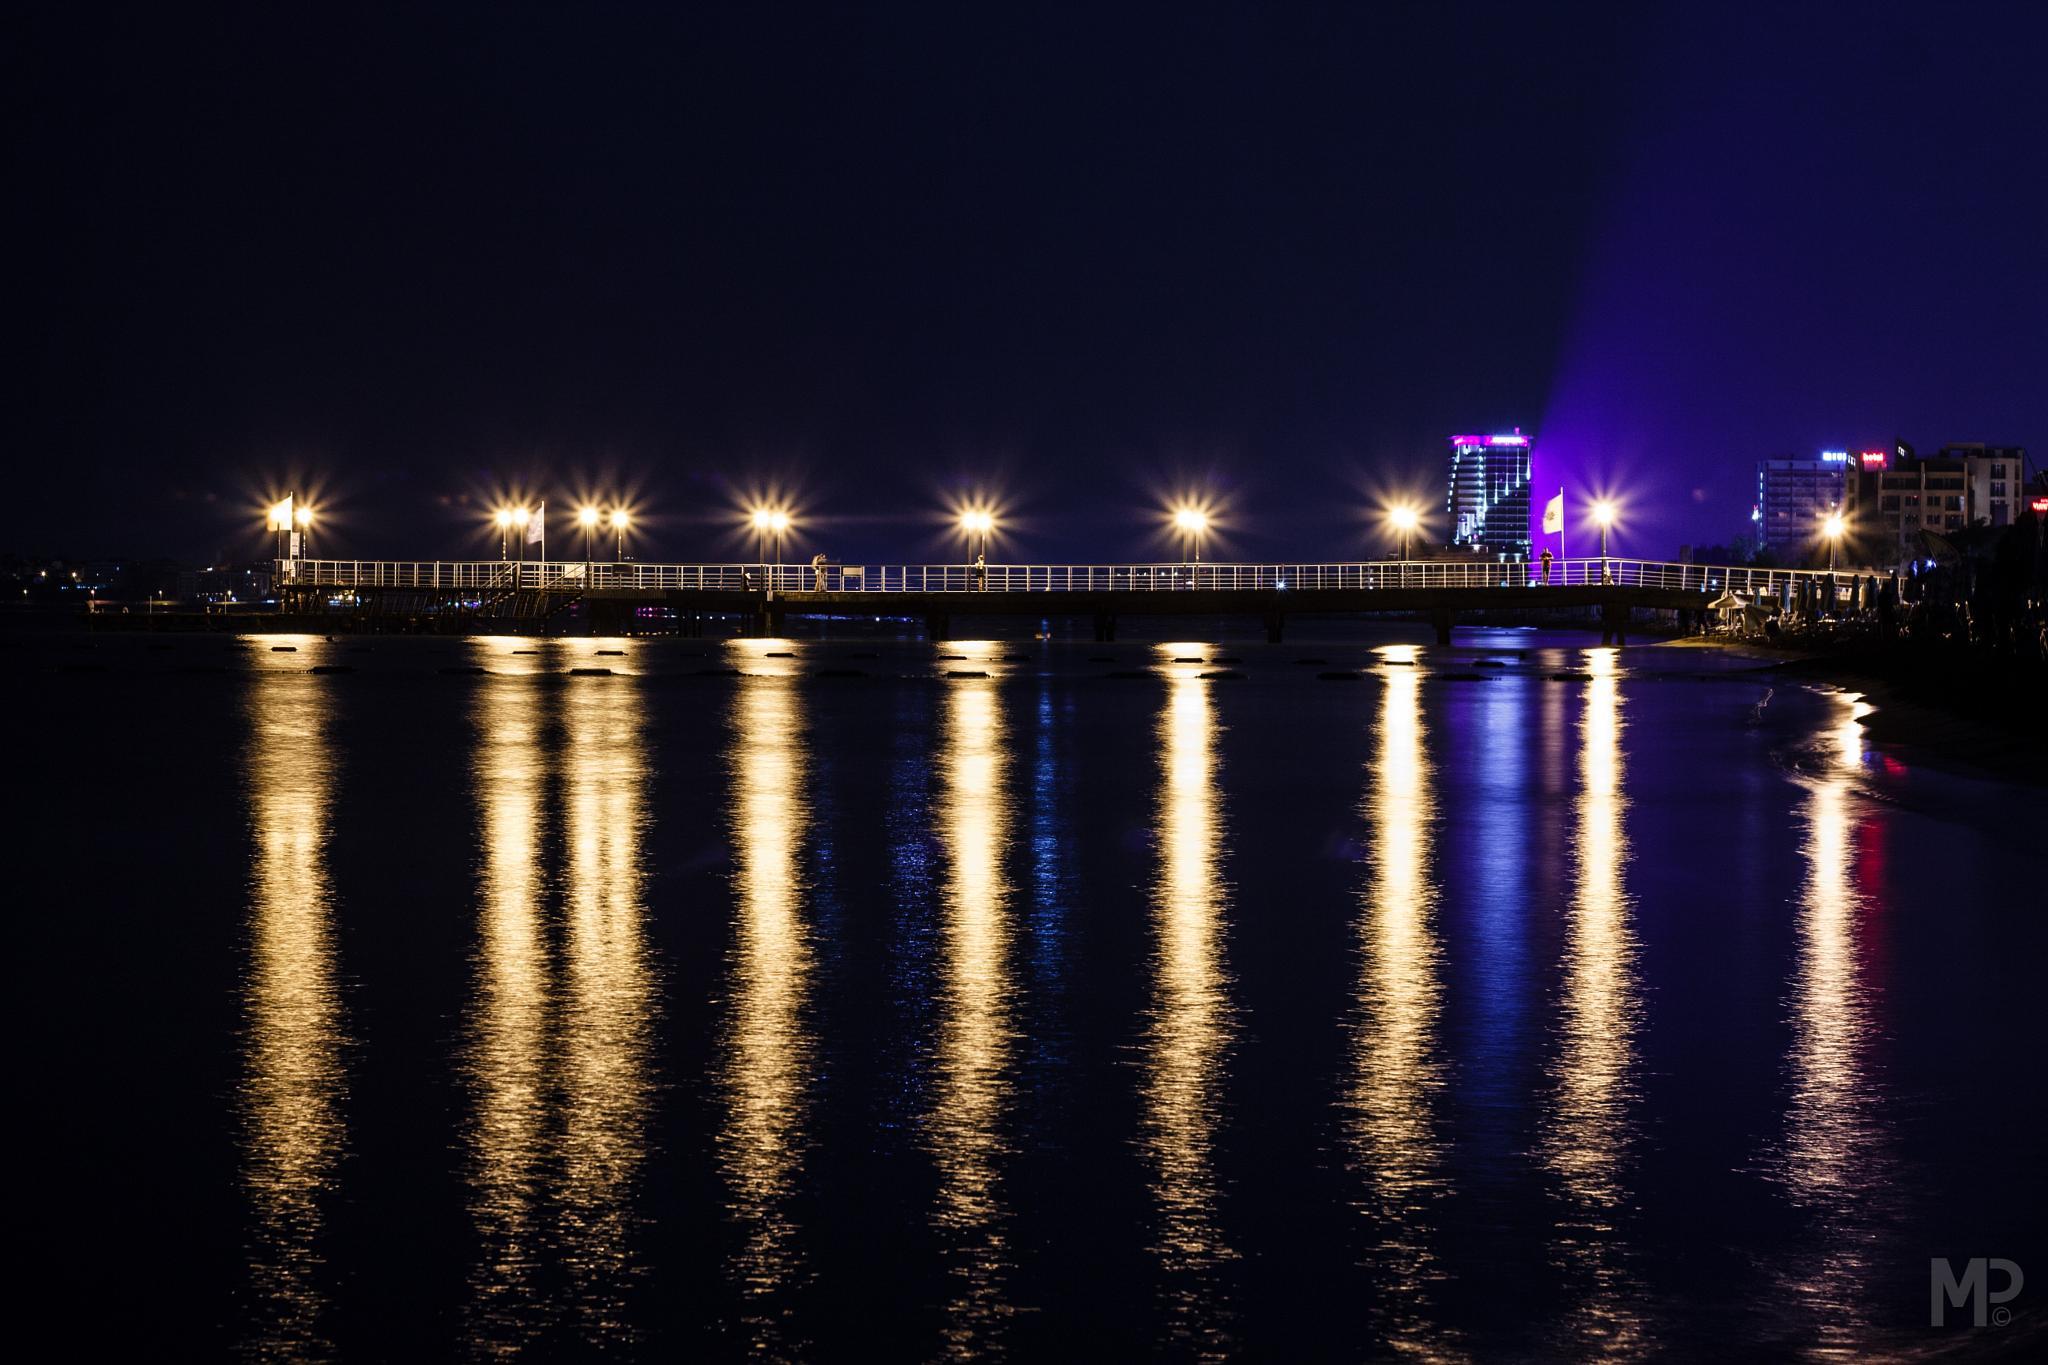 Night pier by Michael Pribula